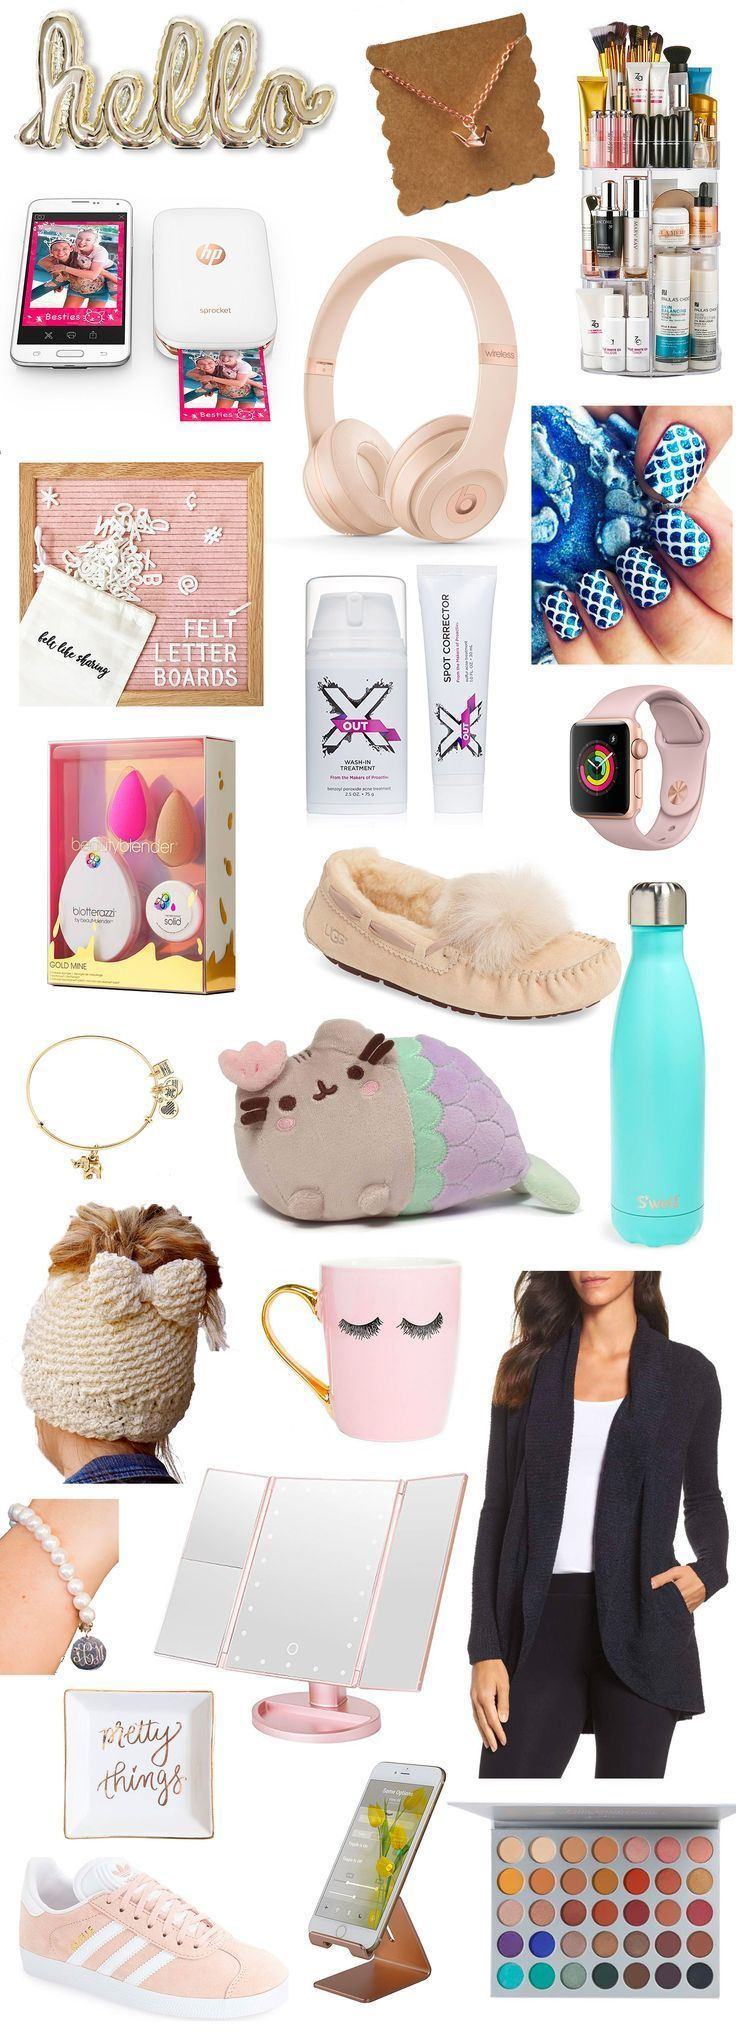 Top Gifts for Teens This Christmas | Ashley Brooke Nicholas